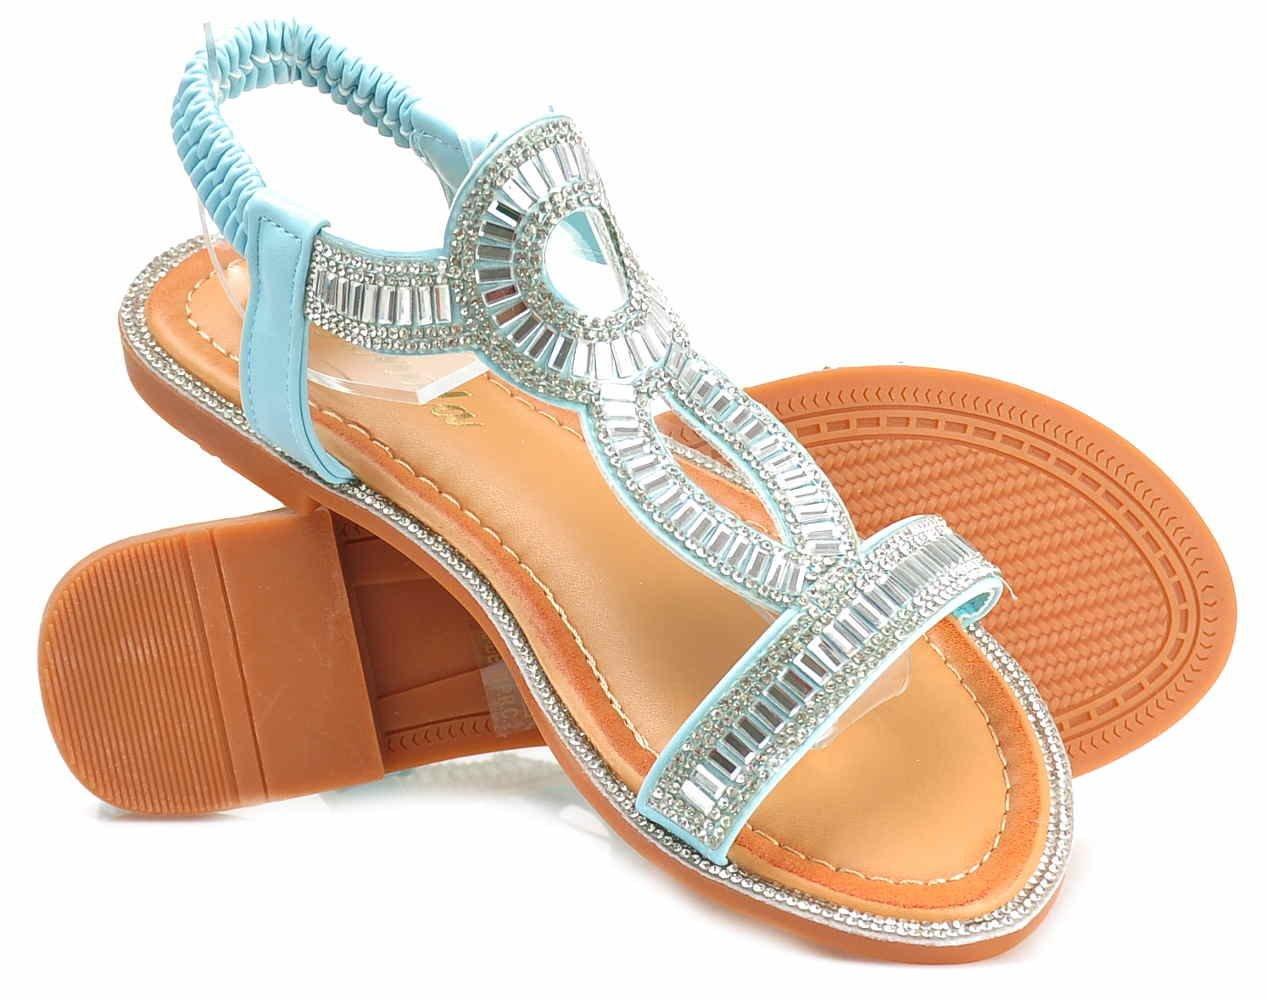 Biżuteryjne sandały damskie na płaskim obcasie BŁĘKITNE E9